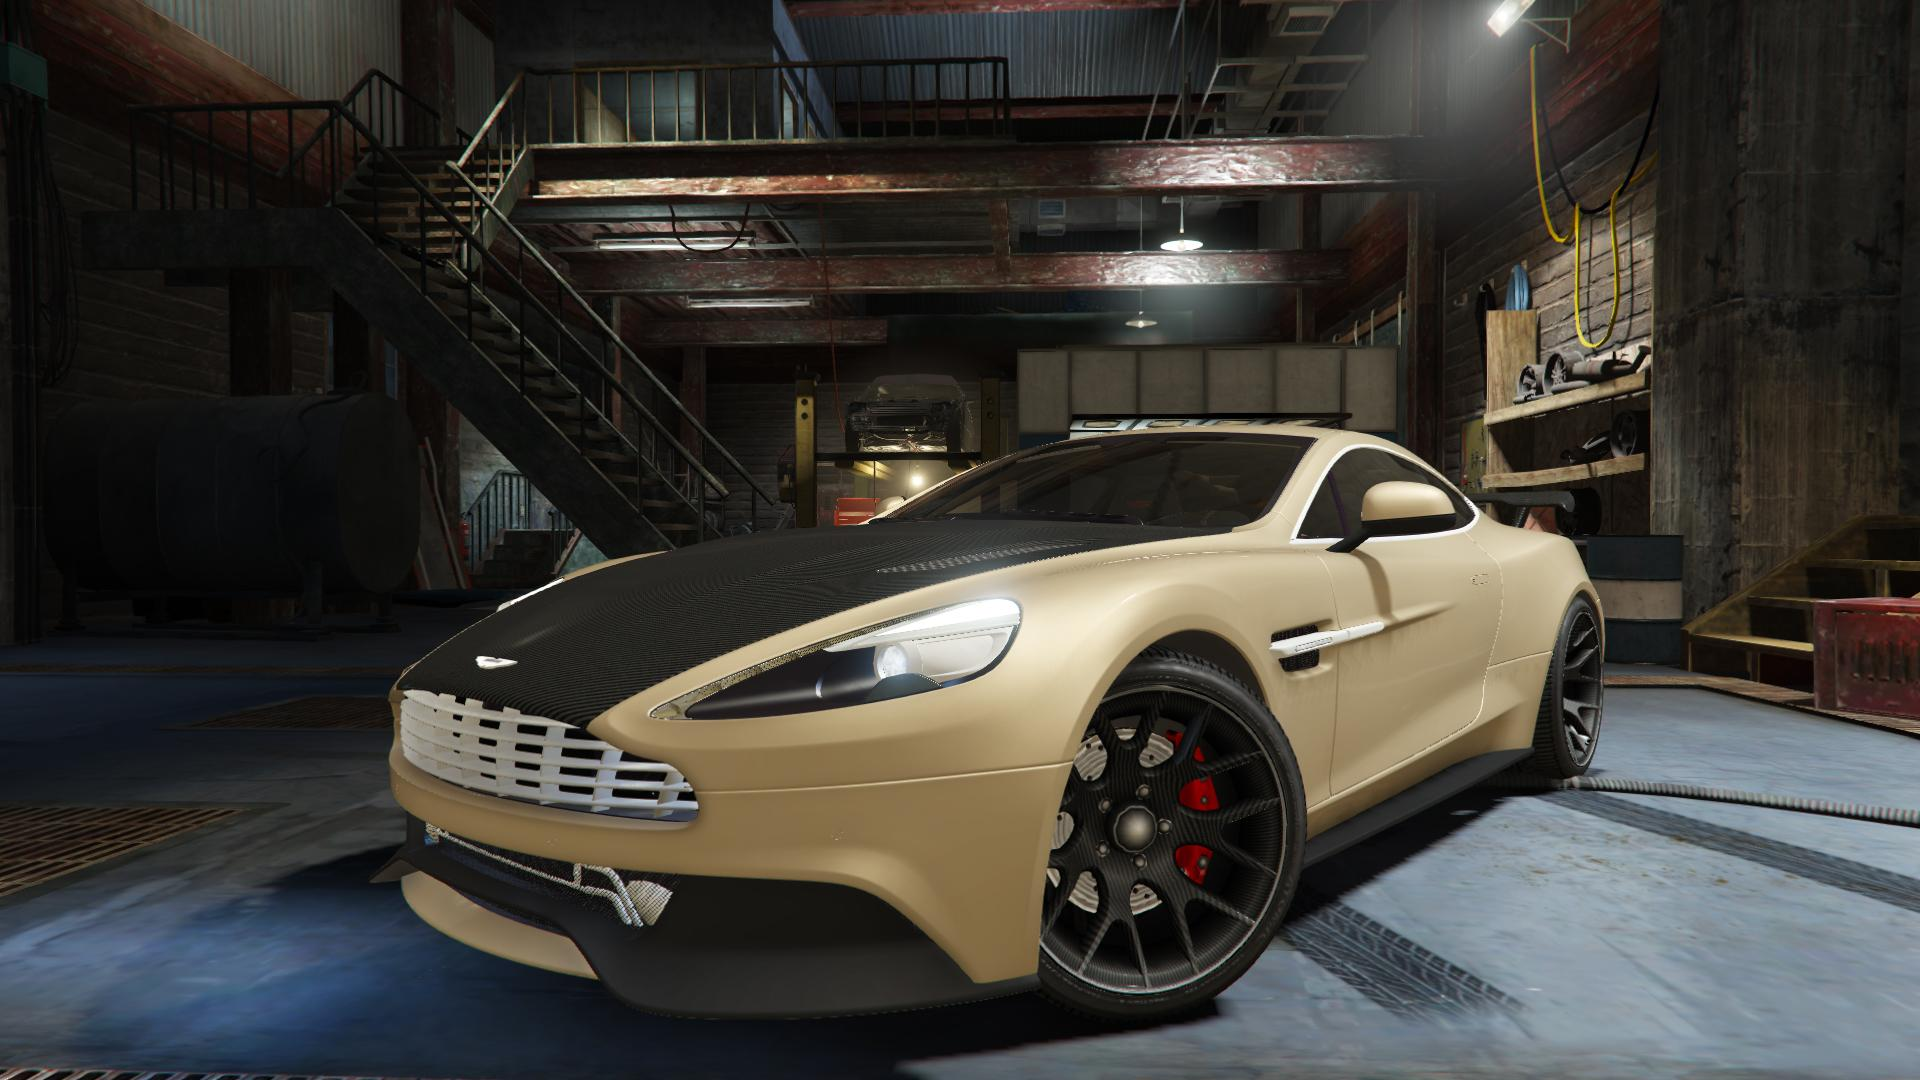 Aston Martin Vanquish V12 2015 Tuning Gta5 Mods Com